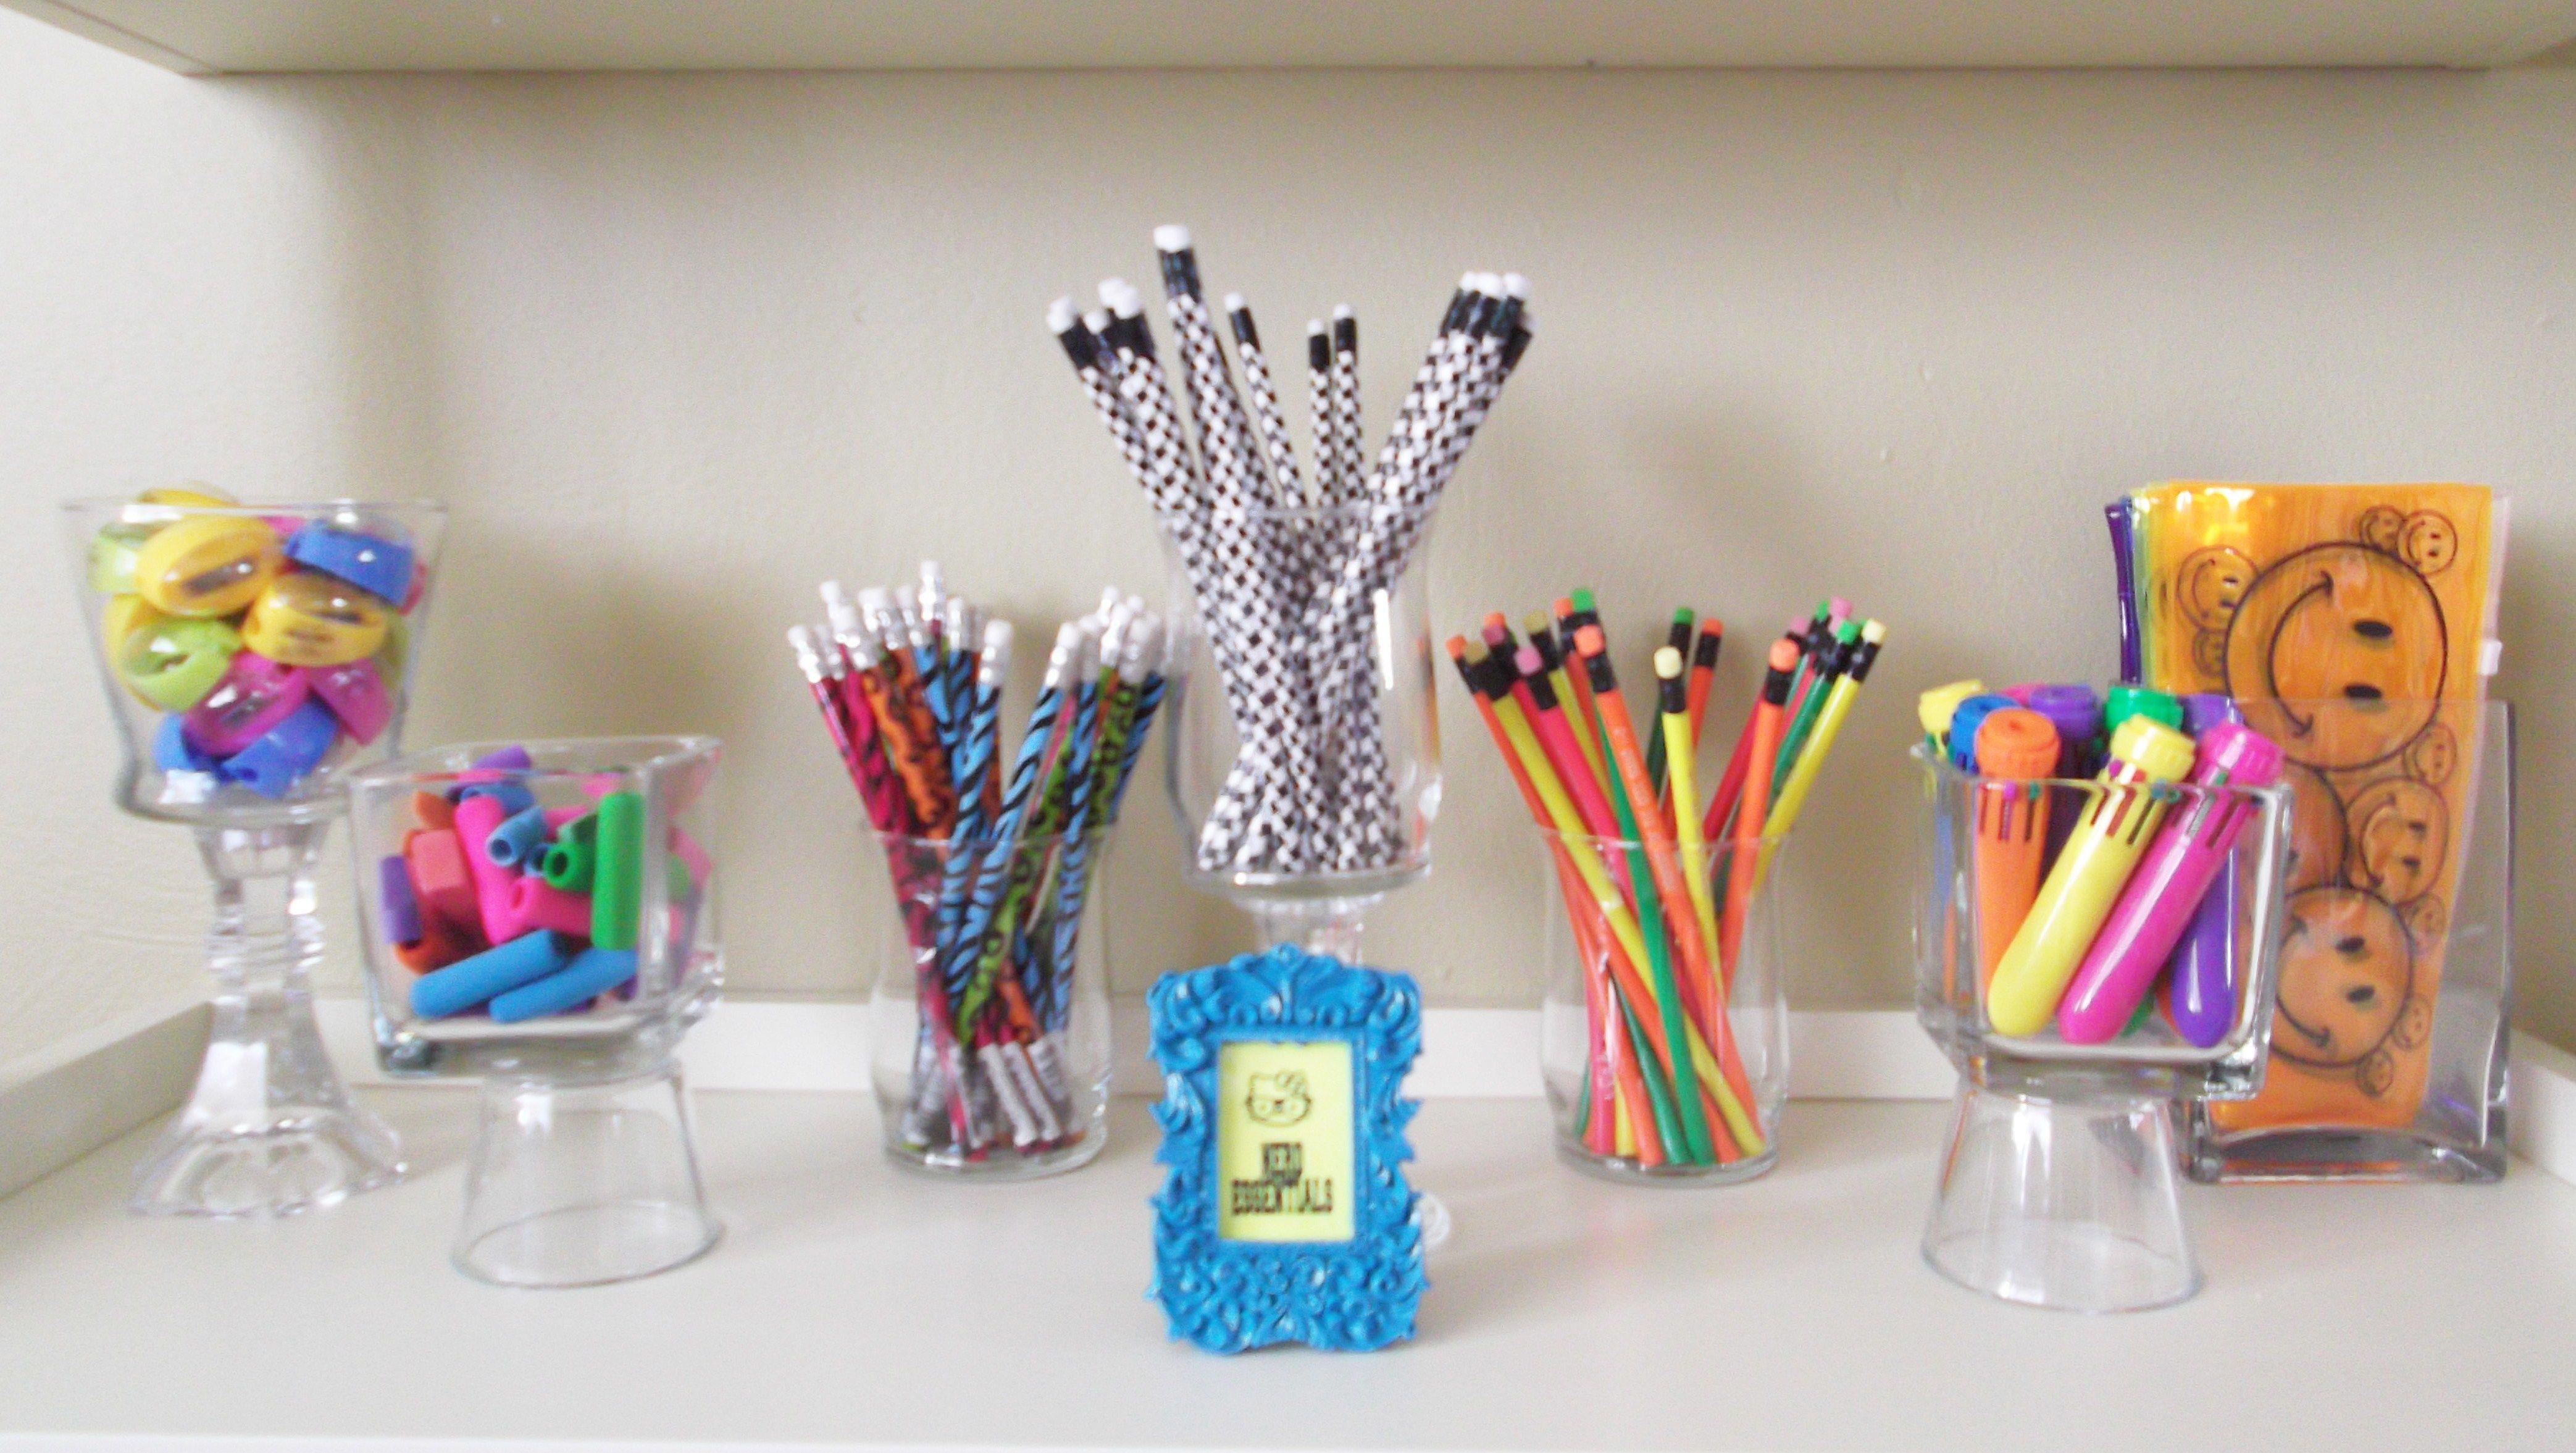 Nerd Essentials Pencils Erasers Pencil Grips Pencil